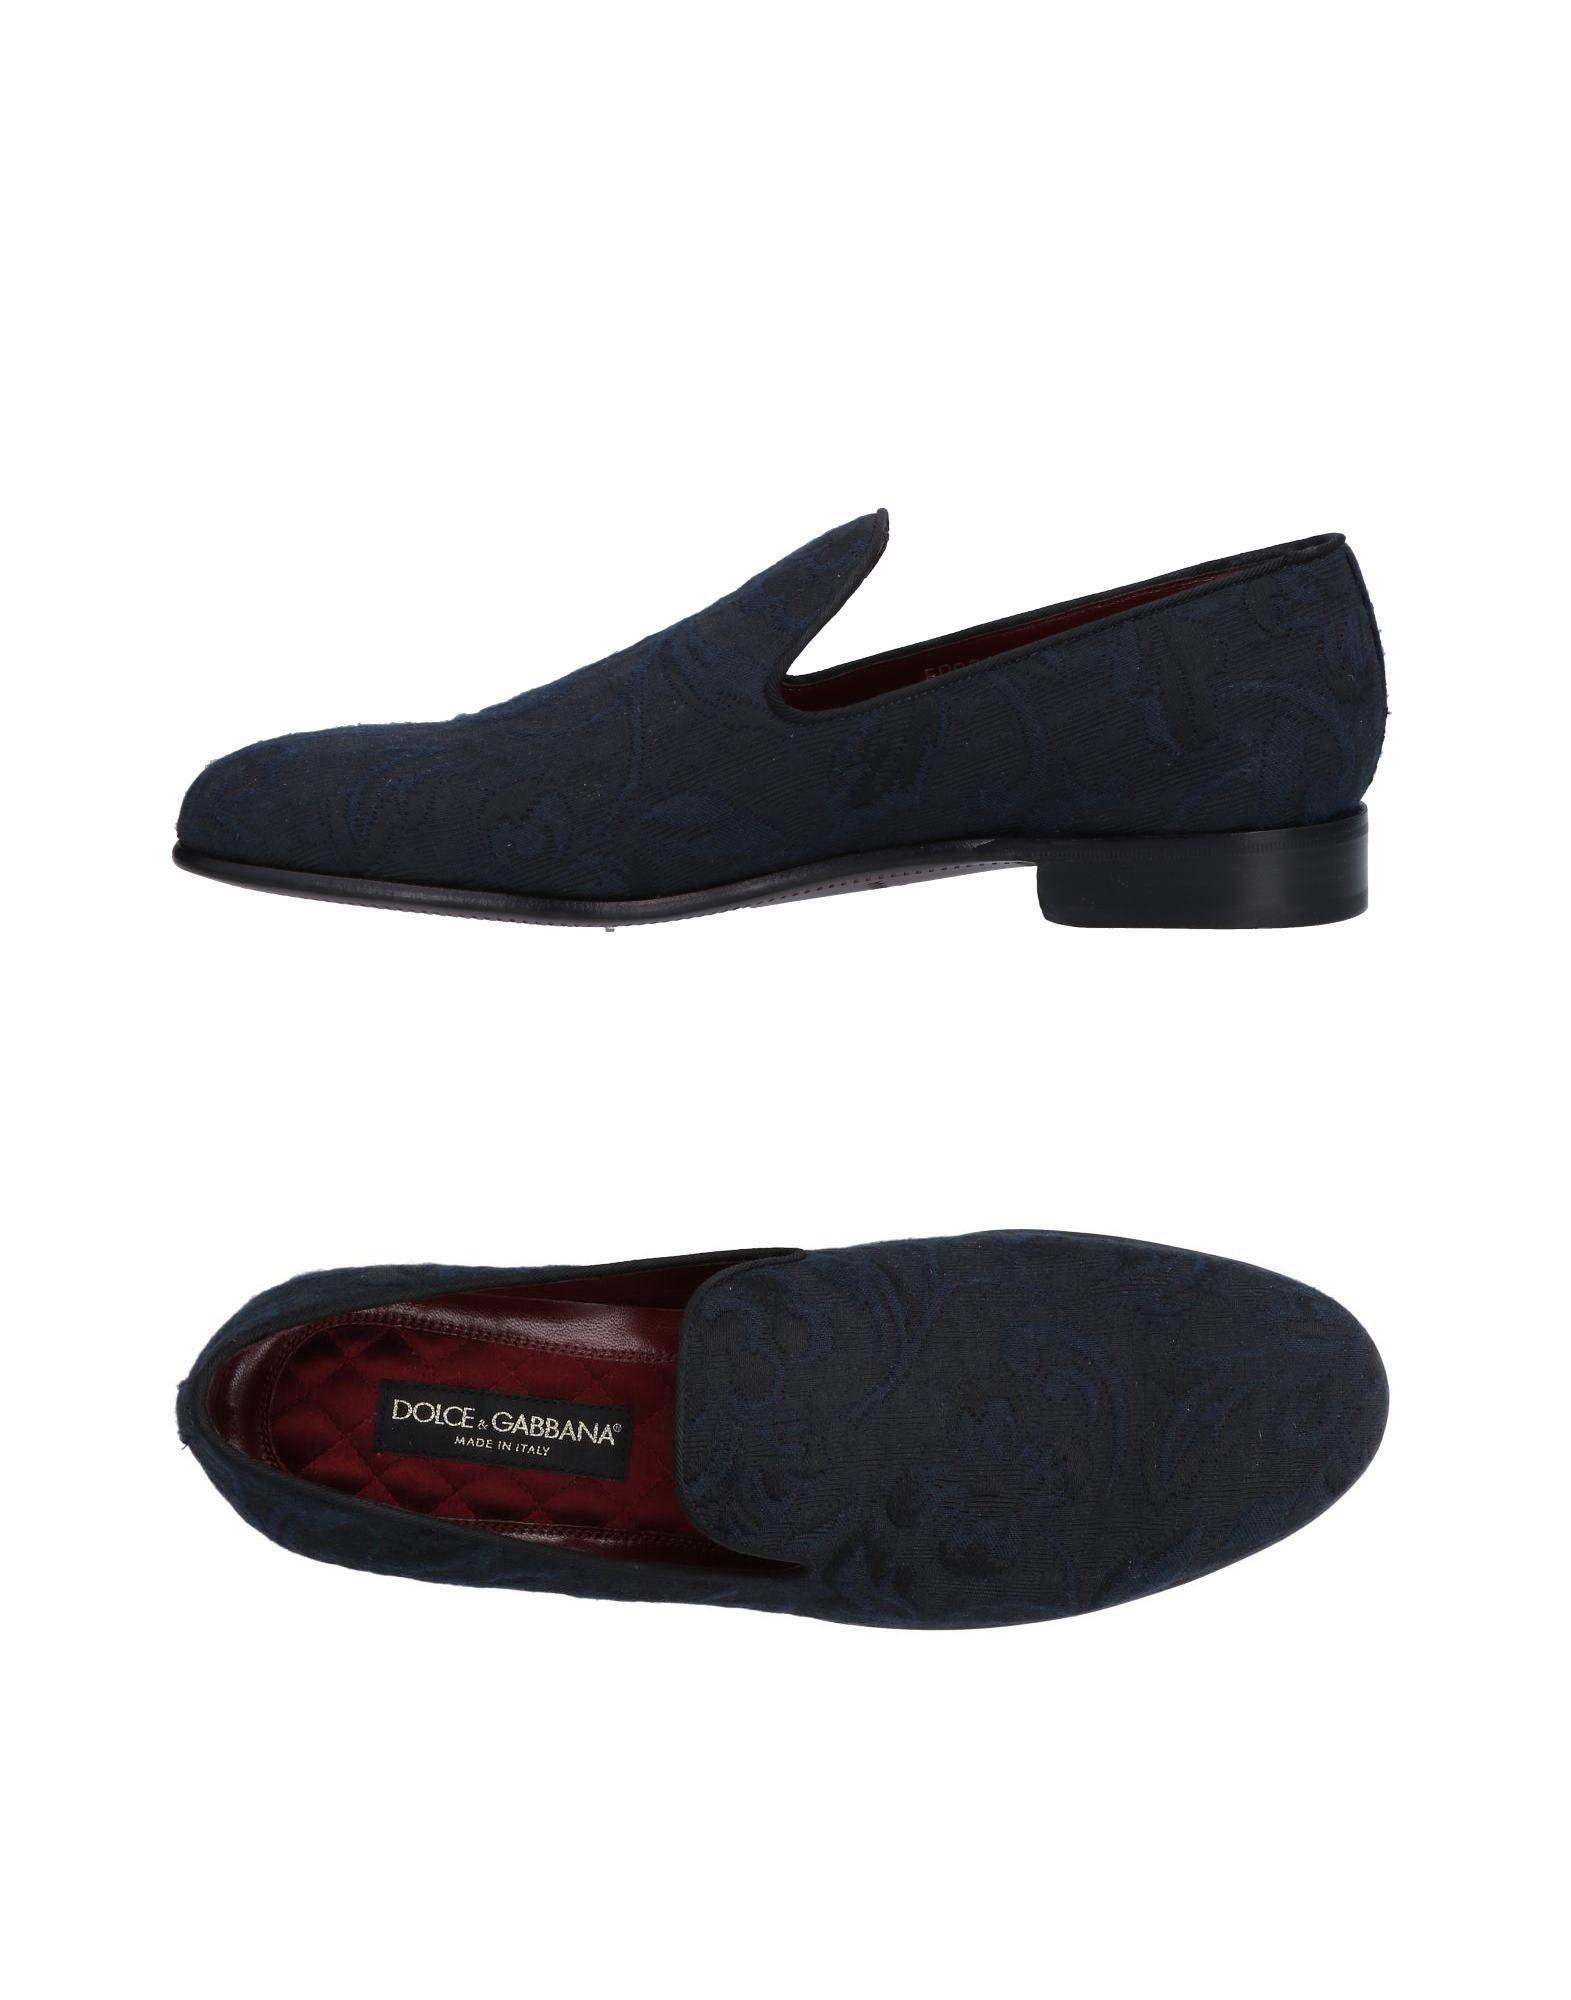 Dolce & Gabbana Mokassins Schuhe Herren  11492502JE Neue Schuhe Mokassins 00bb20